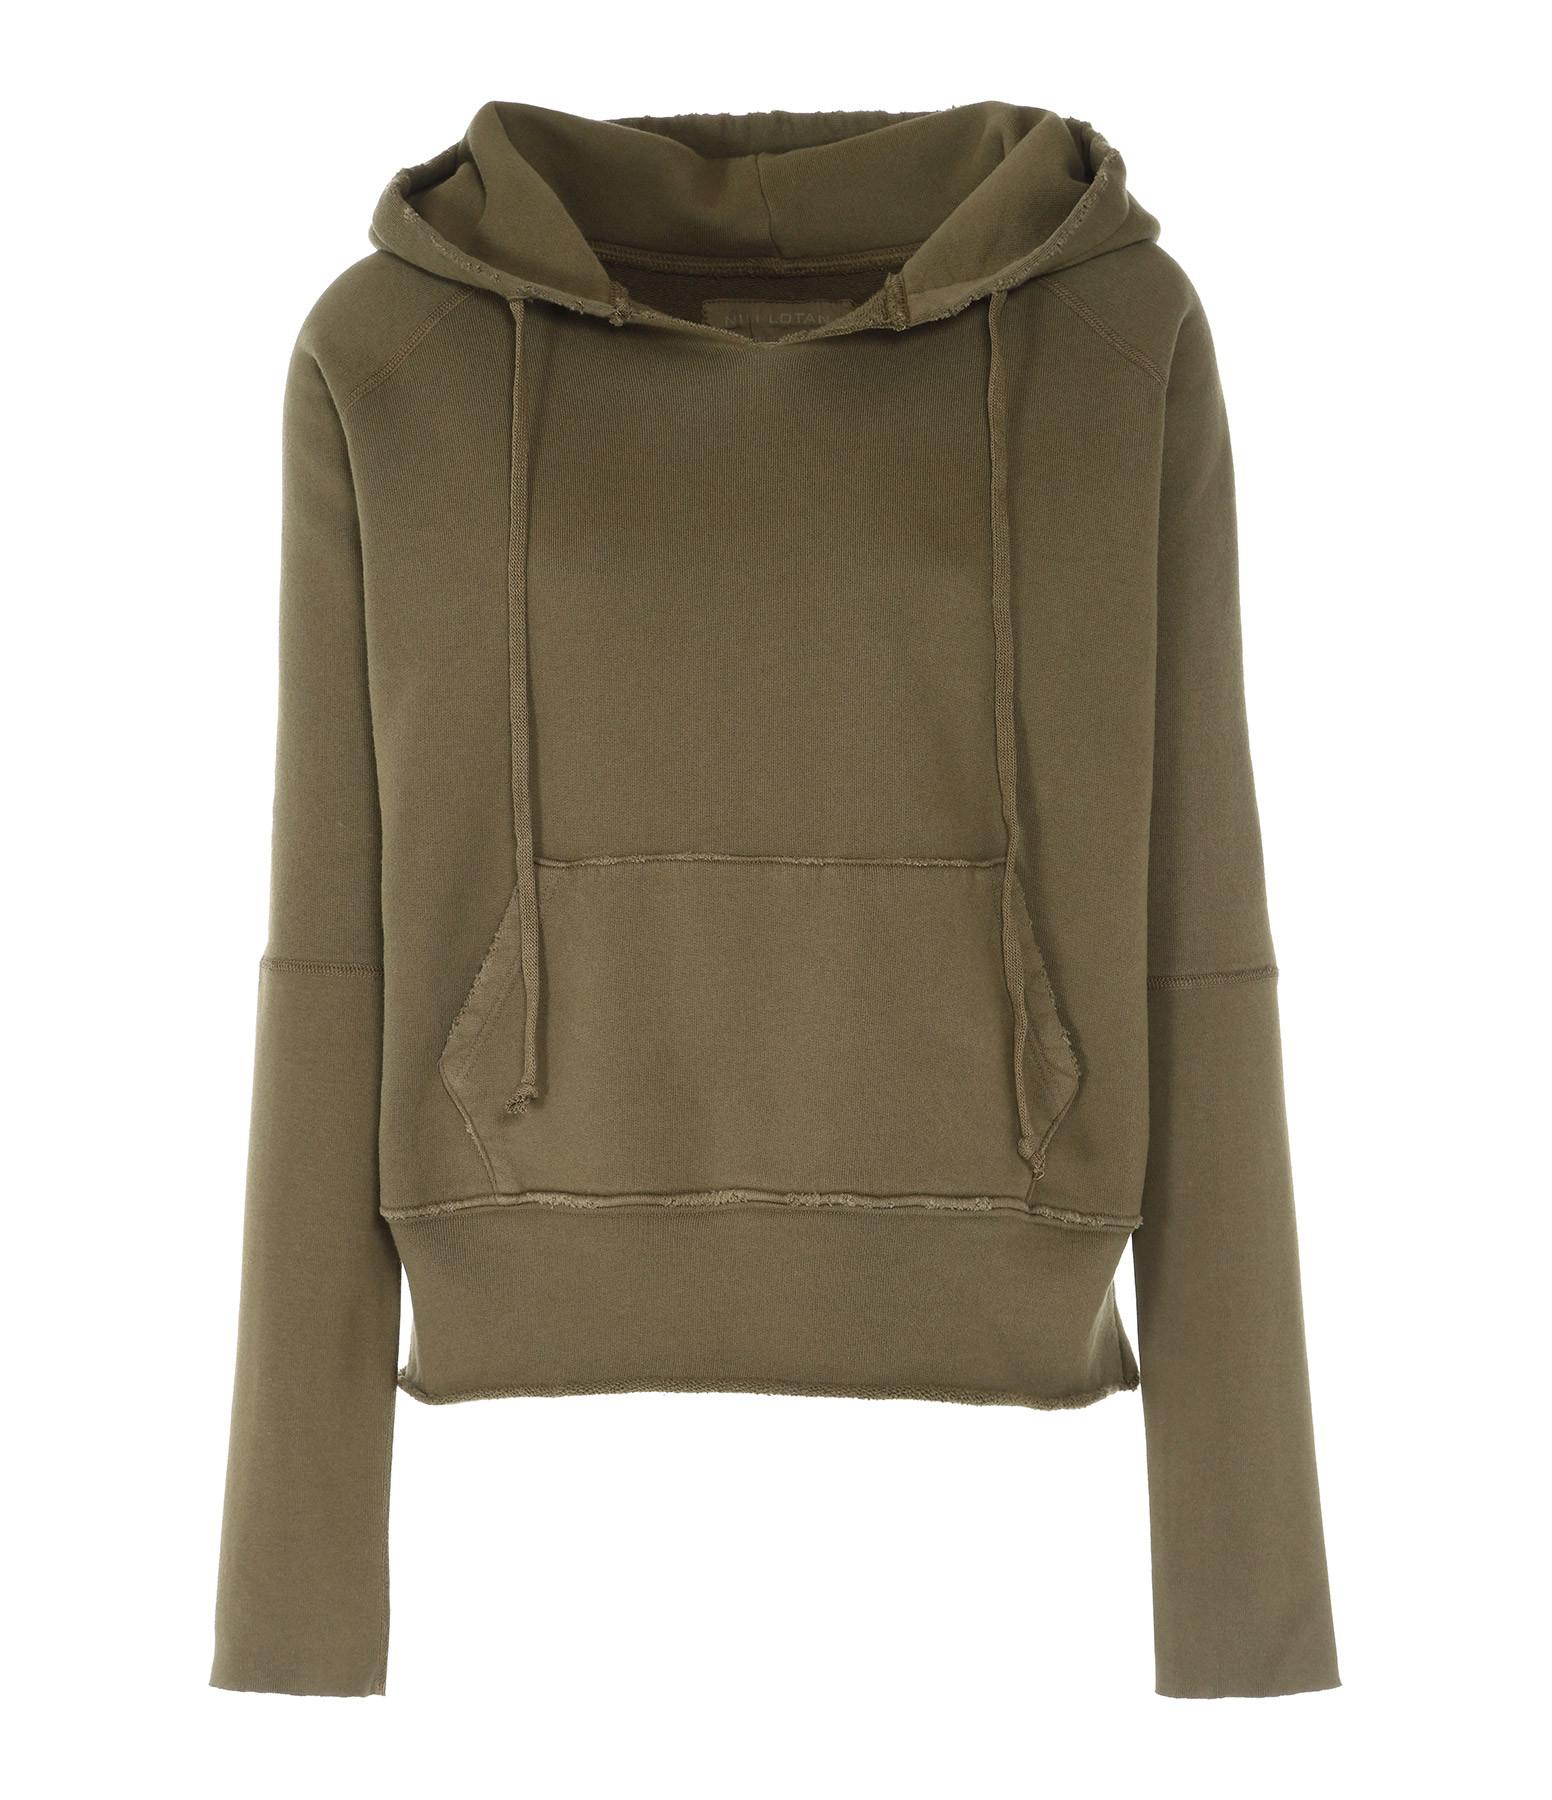 NILI LOTAN - Sweatshirt Janie Army